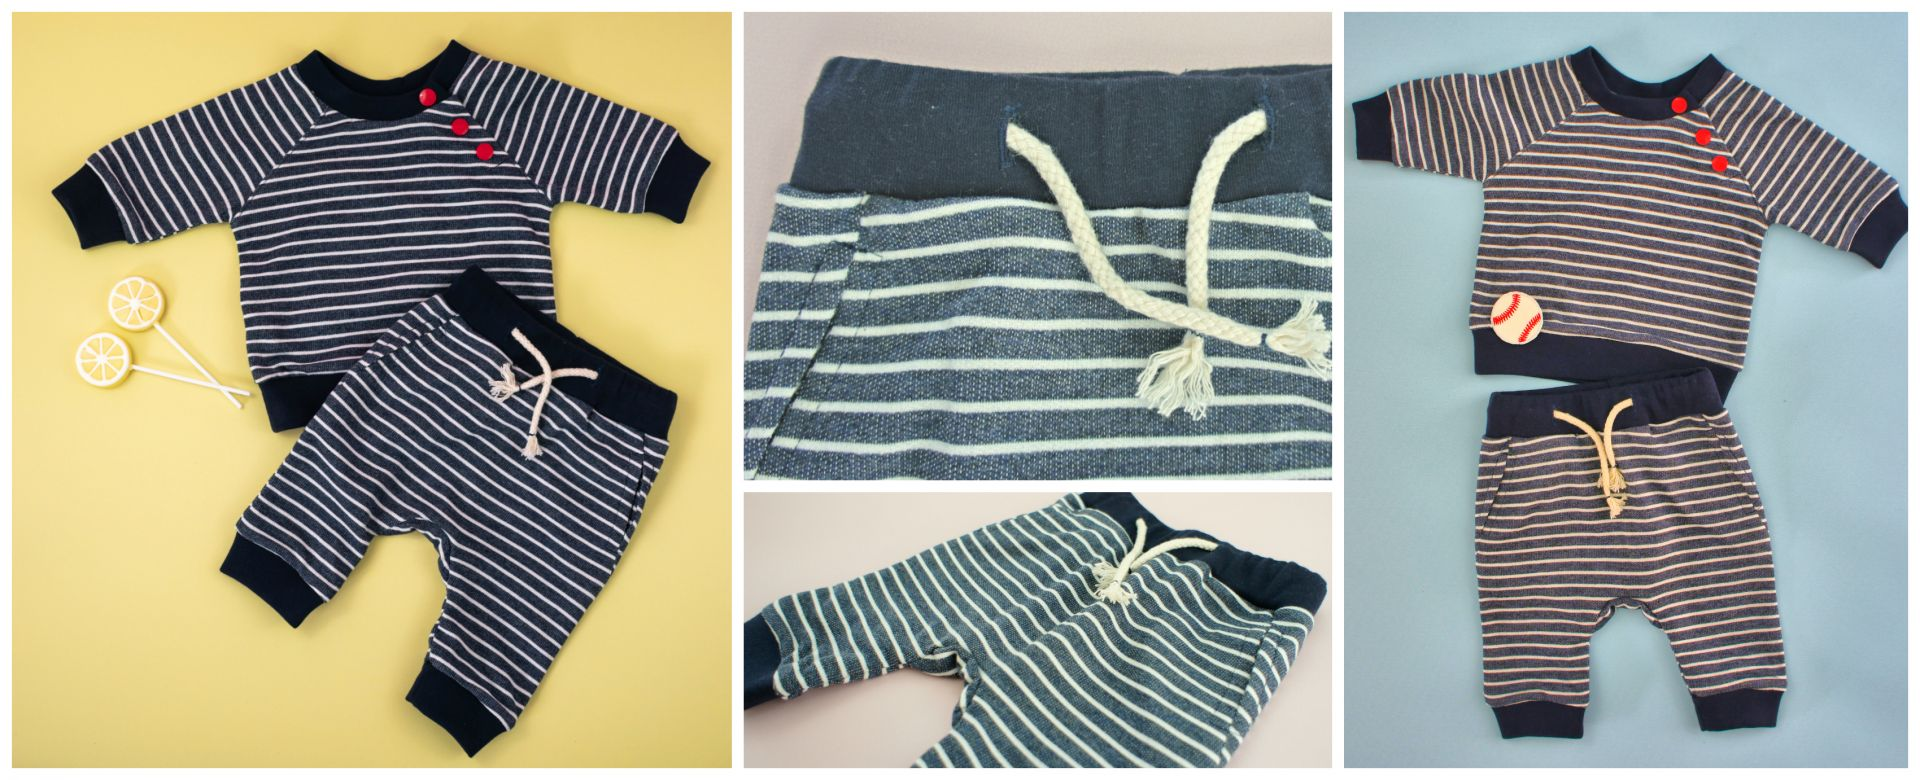 Baby joggers and Sweatshirt | Romper | Bubble Gum. Beginner PDF Sewing Pattern.<span>Blue stripe cotton knit fabric baby jogging pants. Baseball applique. Frocks and Frolics pdf sewing pattern.</span>